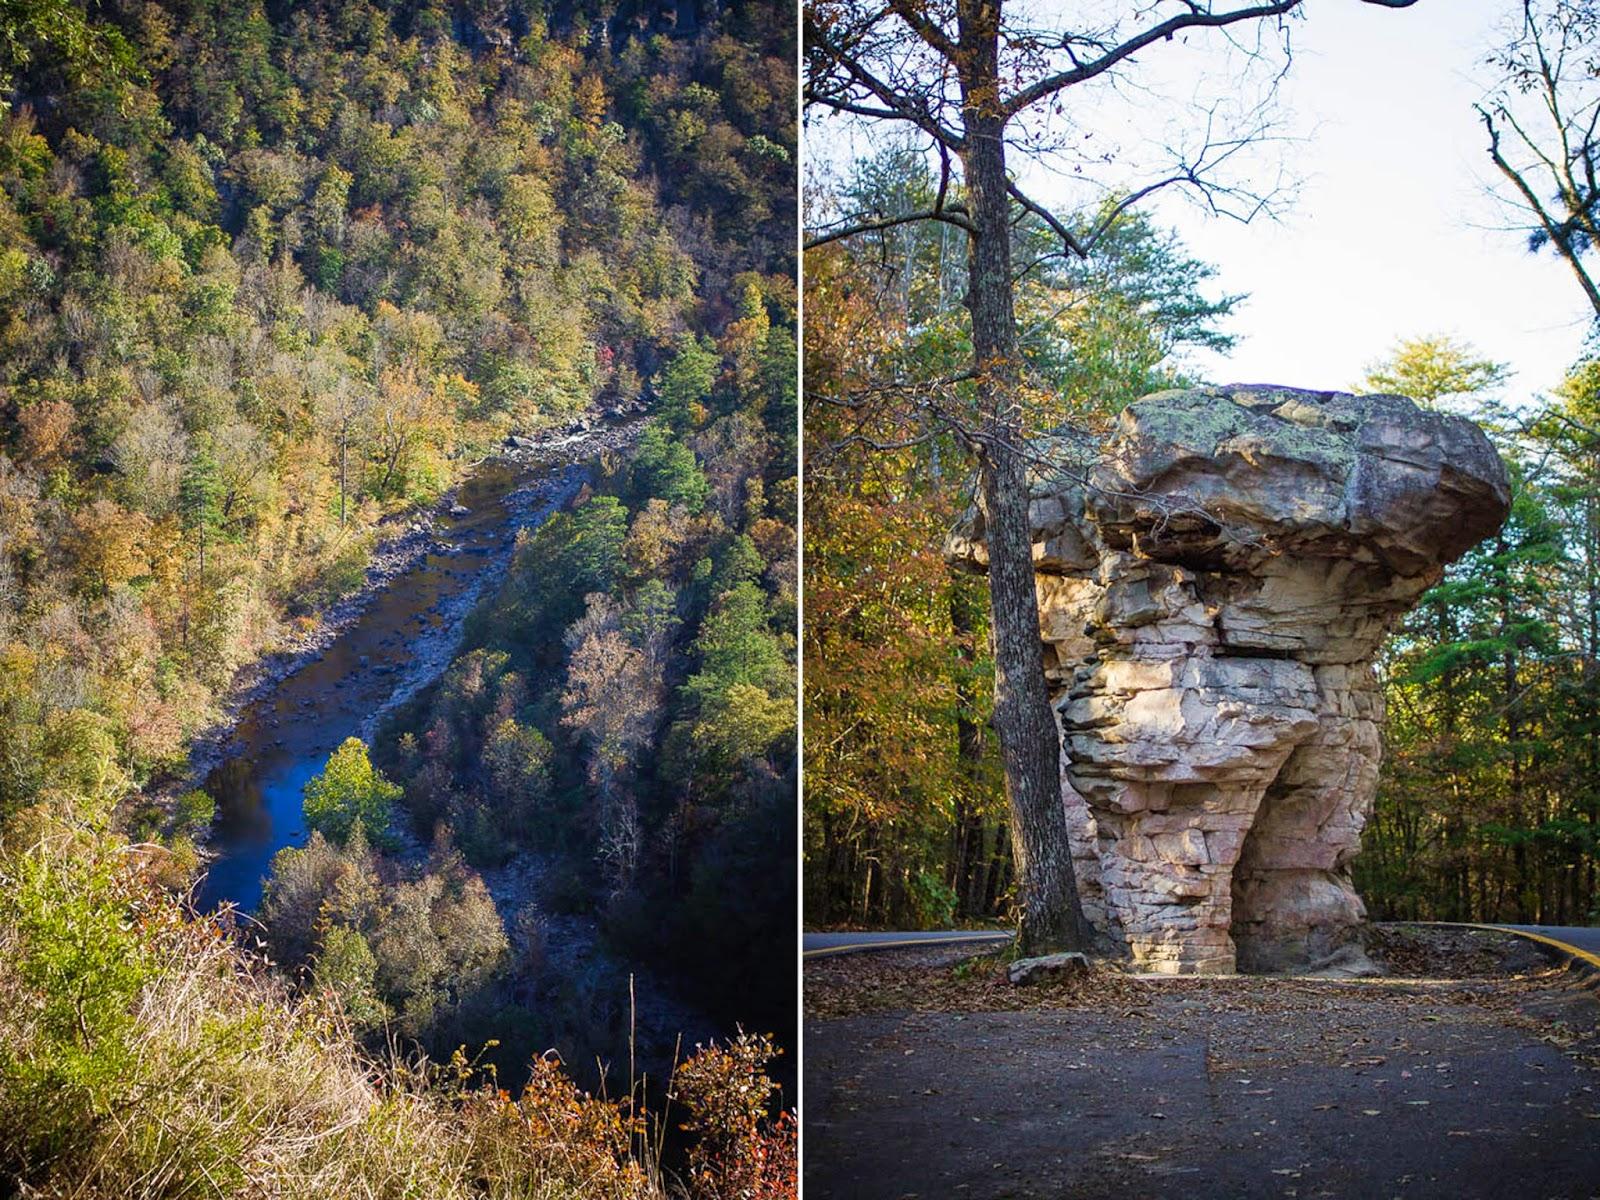 Little River Canyon AL mushroom rock